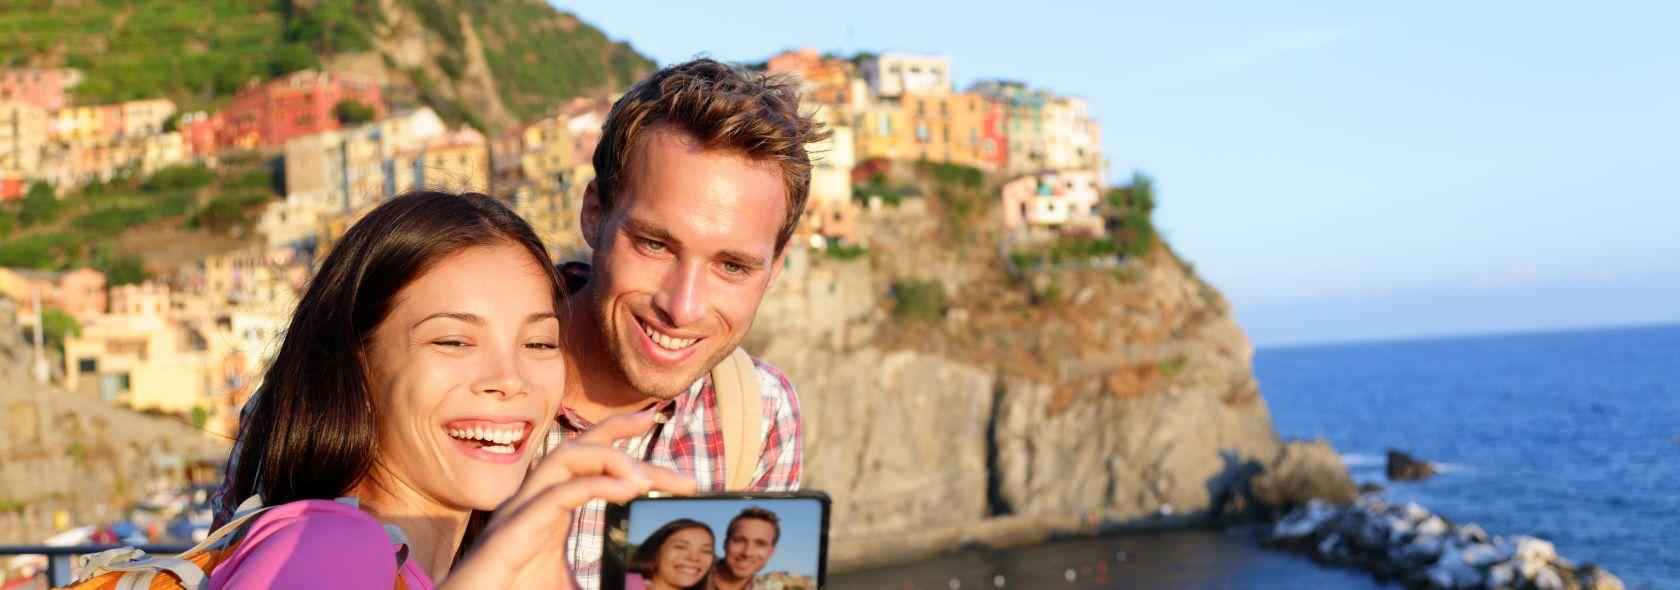 Tour Cinque Terre (UNESCO World Heritage) and Portovenere